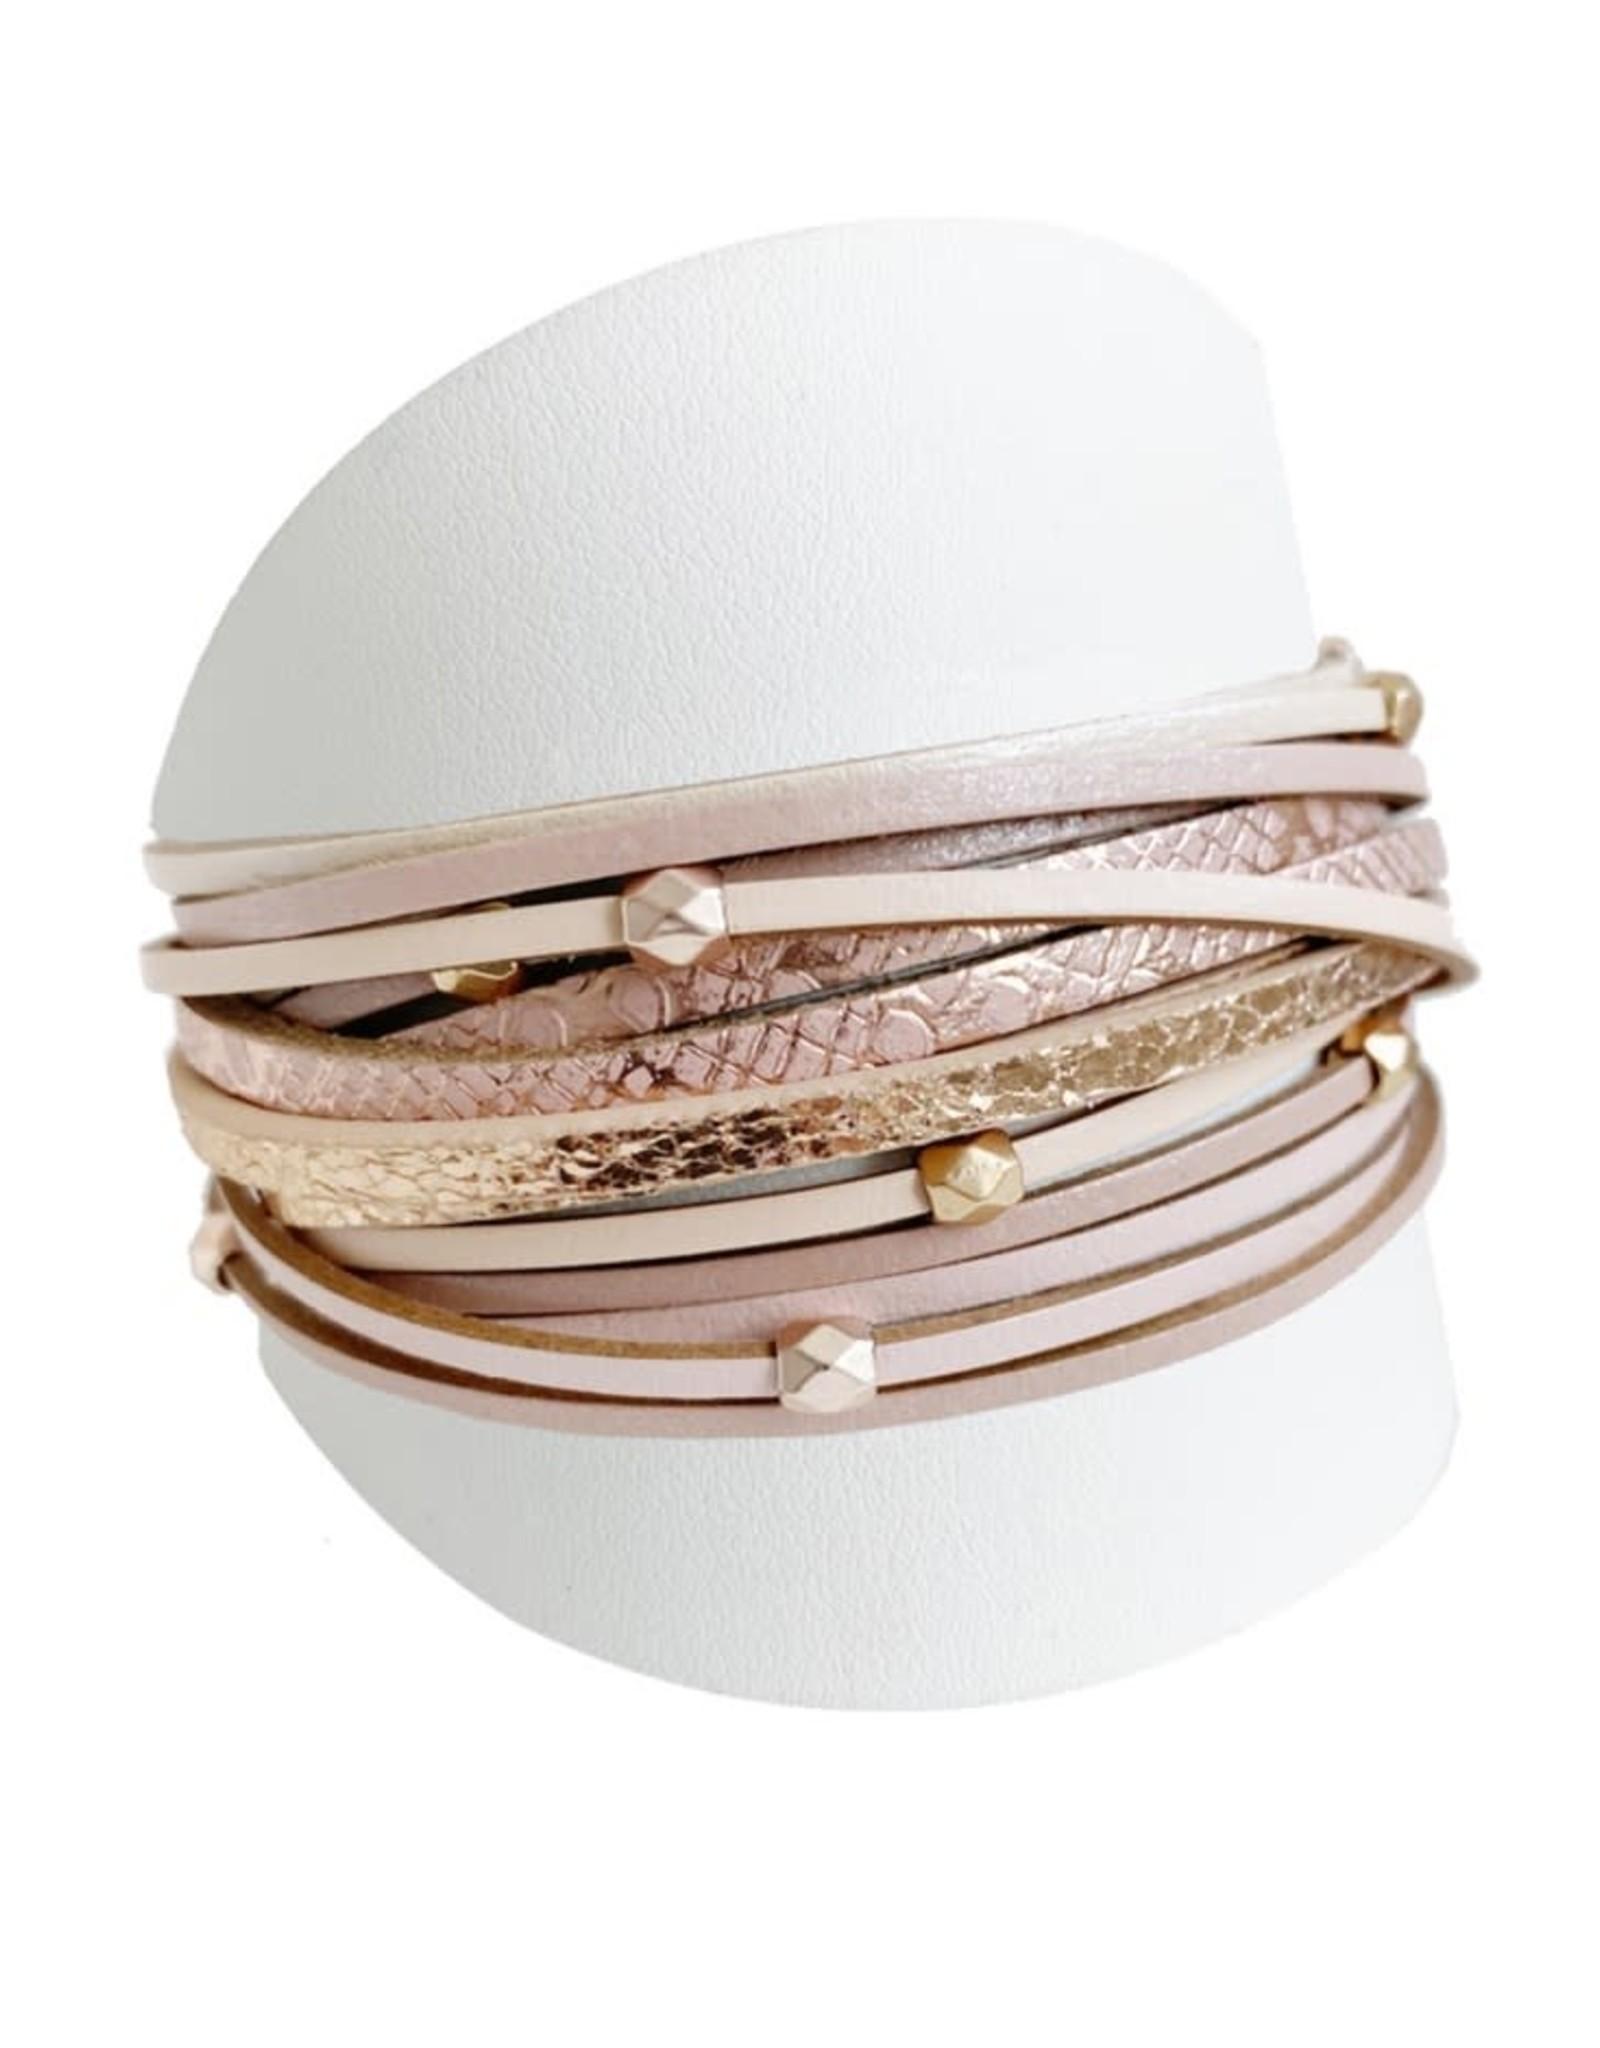 Caracol Bracelet de cuir Beige  - #3137